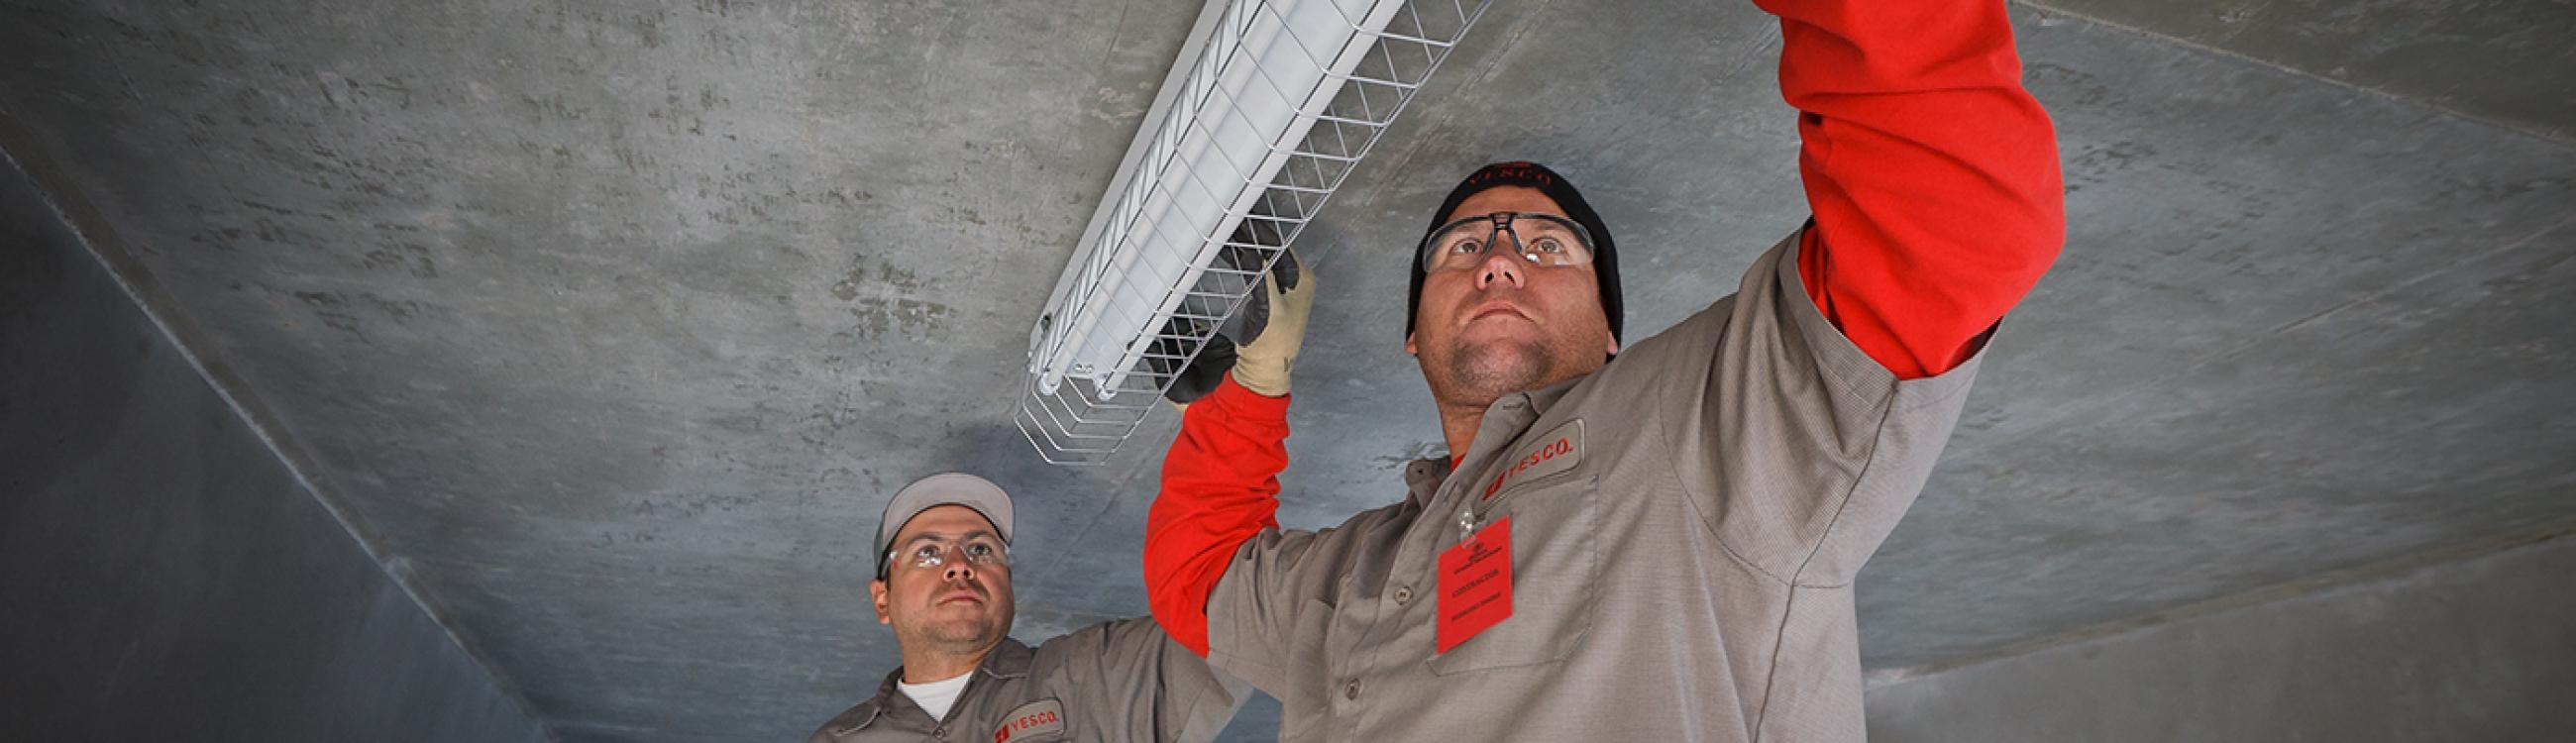 sign & lighting service energy efficient lighting